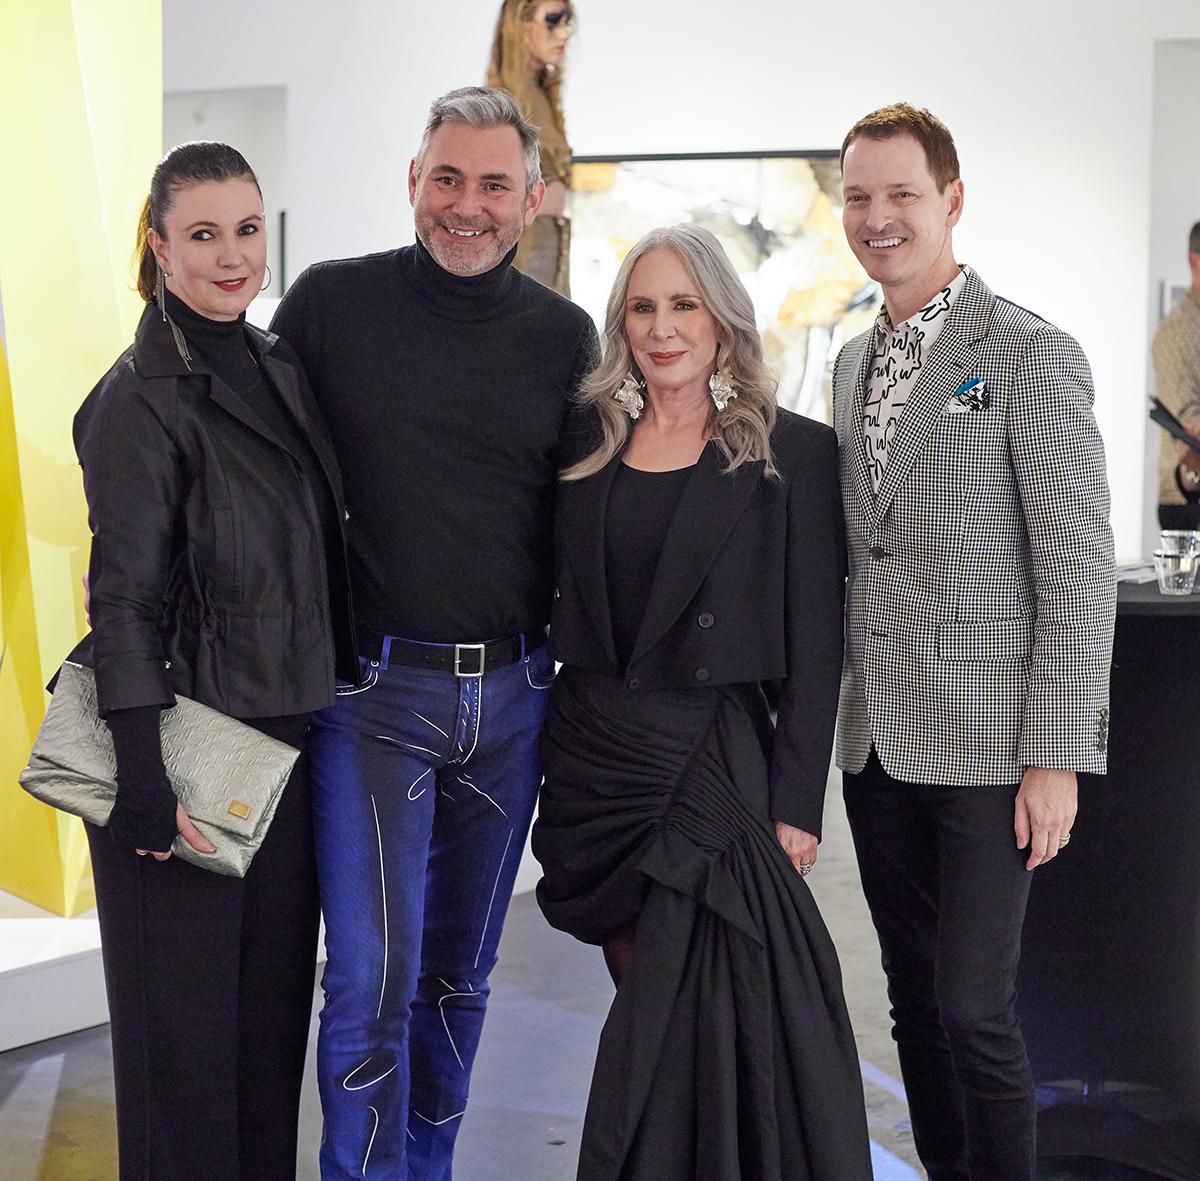 Ana Pettus, Ken Weber, Heidi Dillon and Brian McCulloch